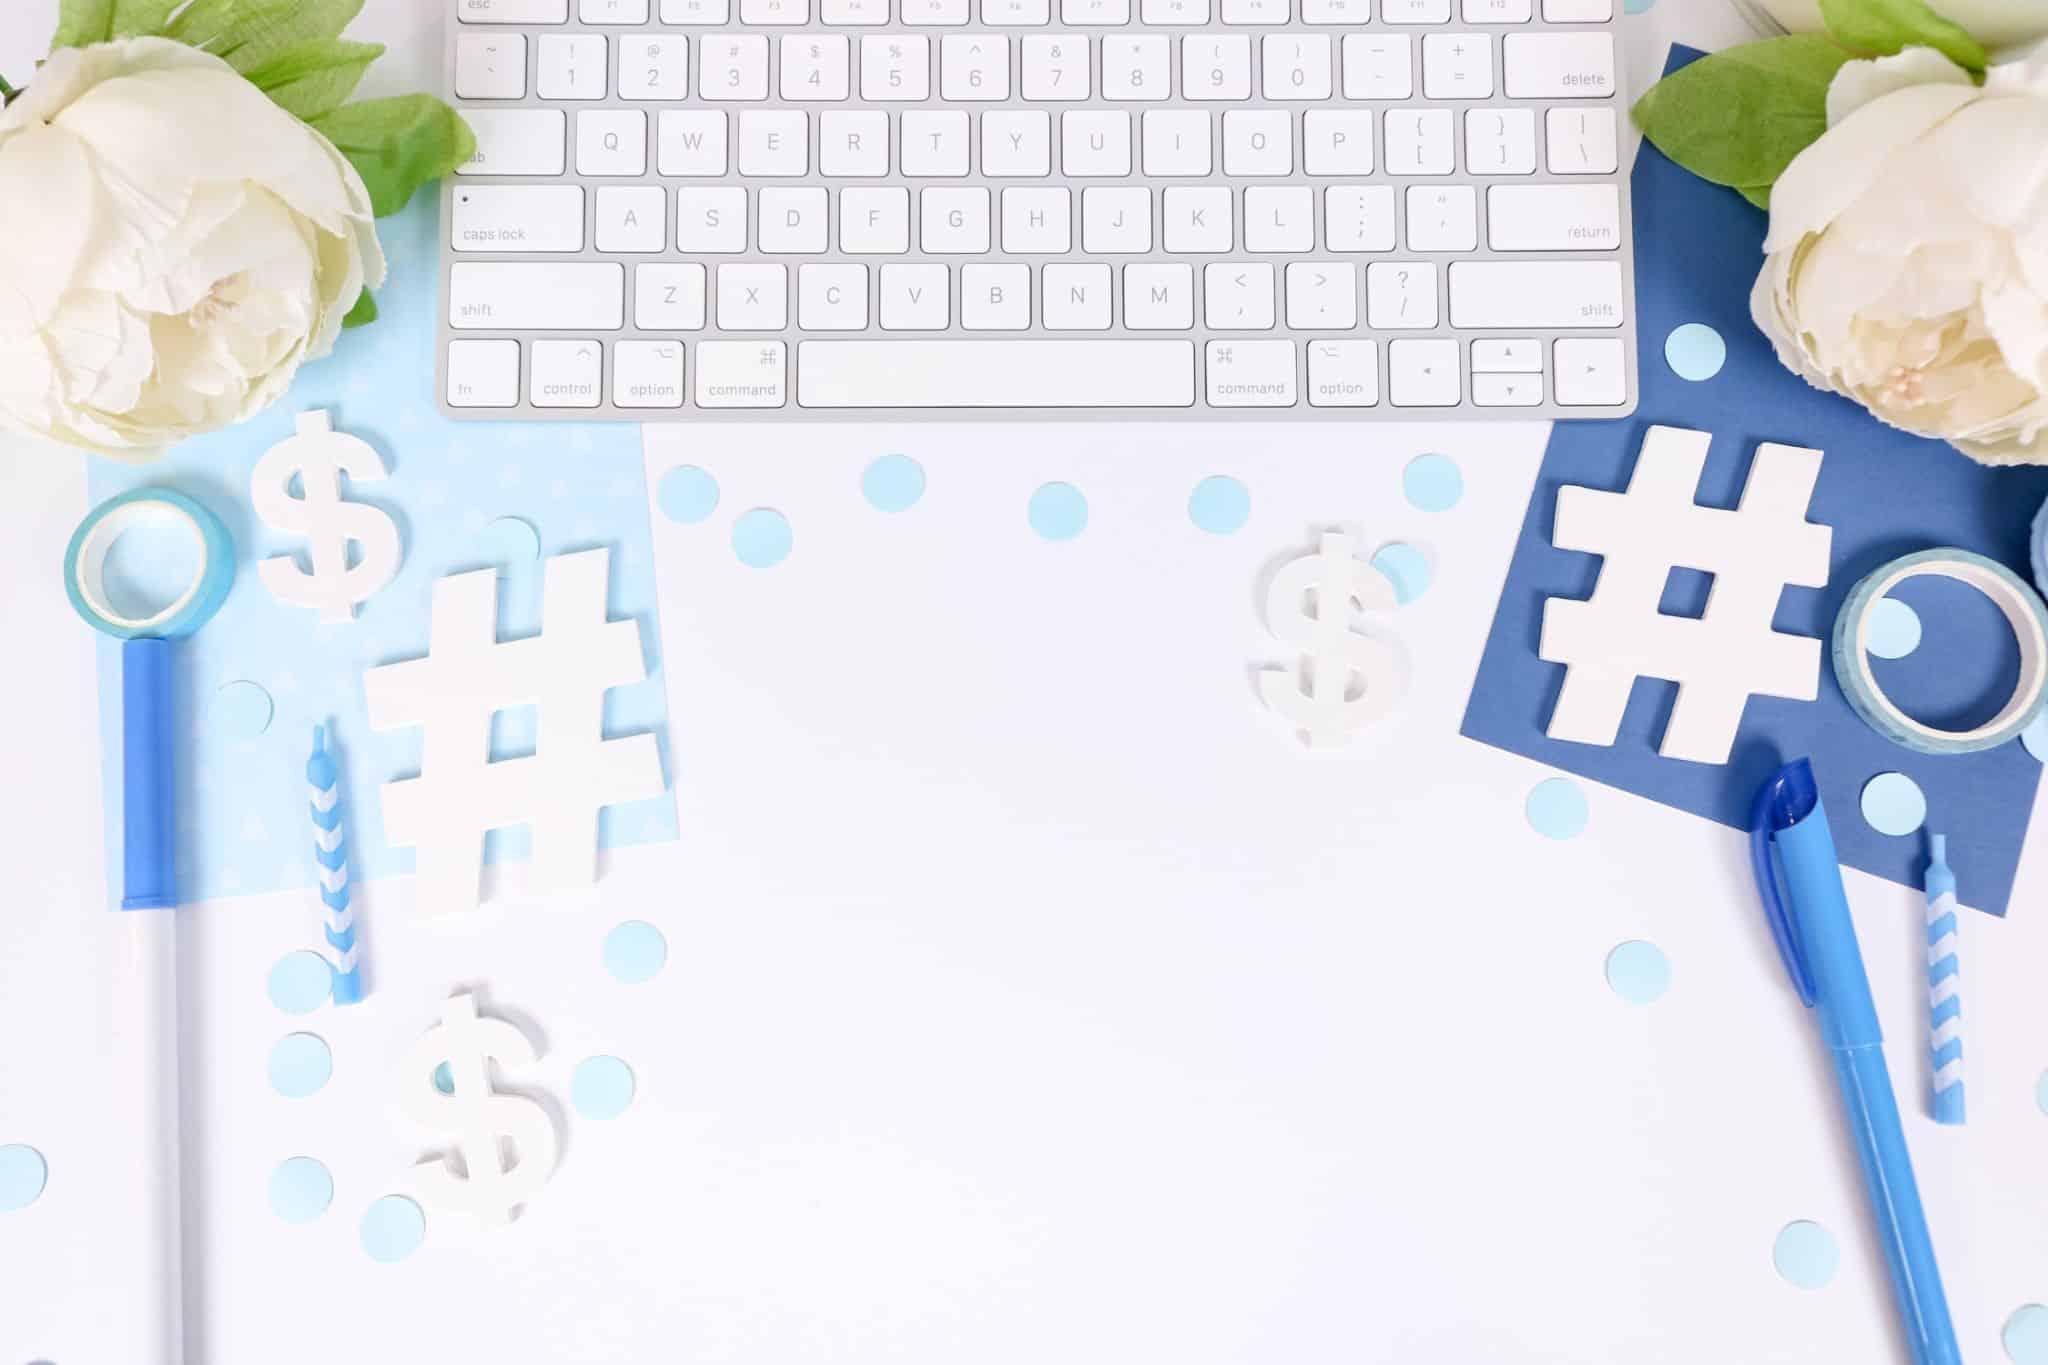 hashtag signs keyboard